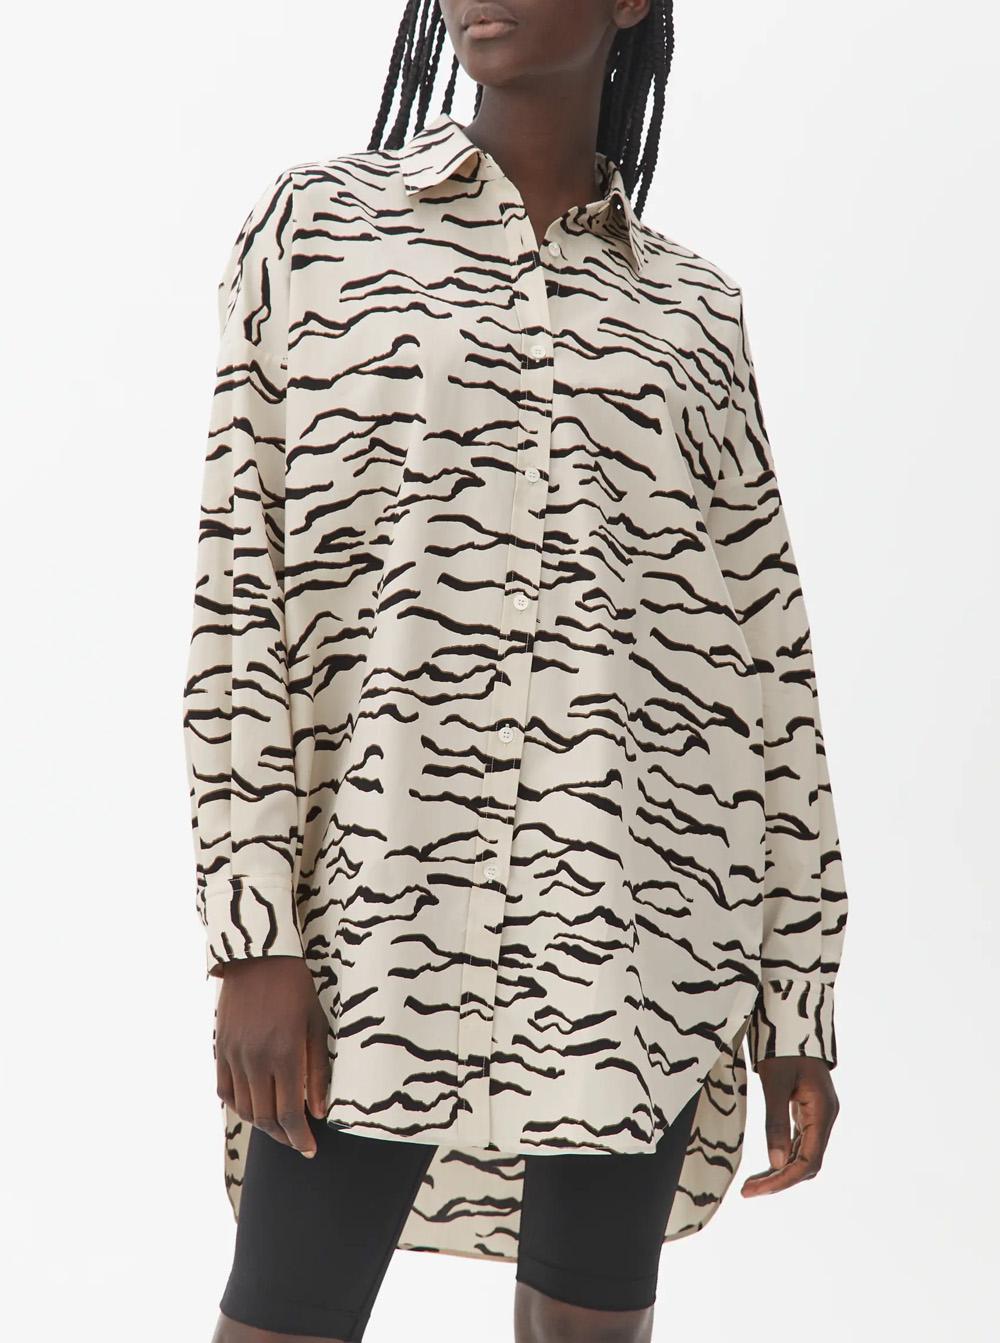 zebra print shirt 2021